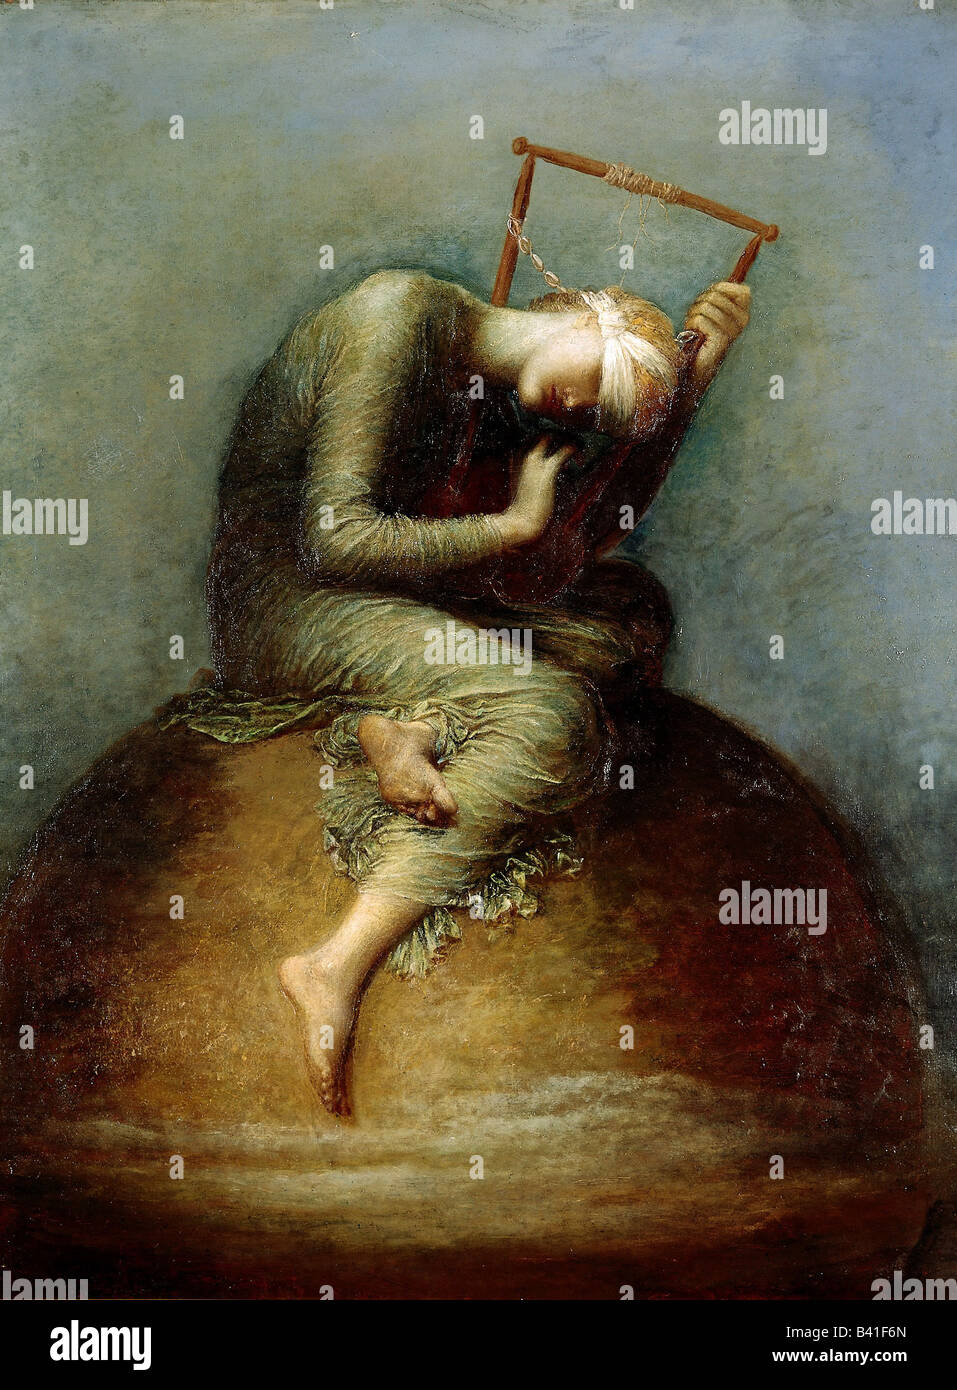 Fine Arts - Watt, George Frederic (1817-1904), Malerei, 'Hope', 1885, Öl auf Leinwand, 141 x 110 cm, Tate Gallery, Stockfoto